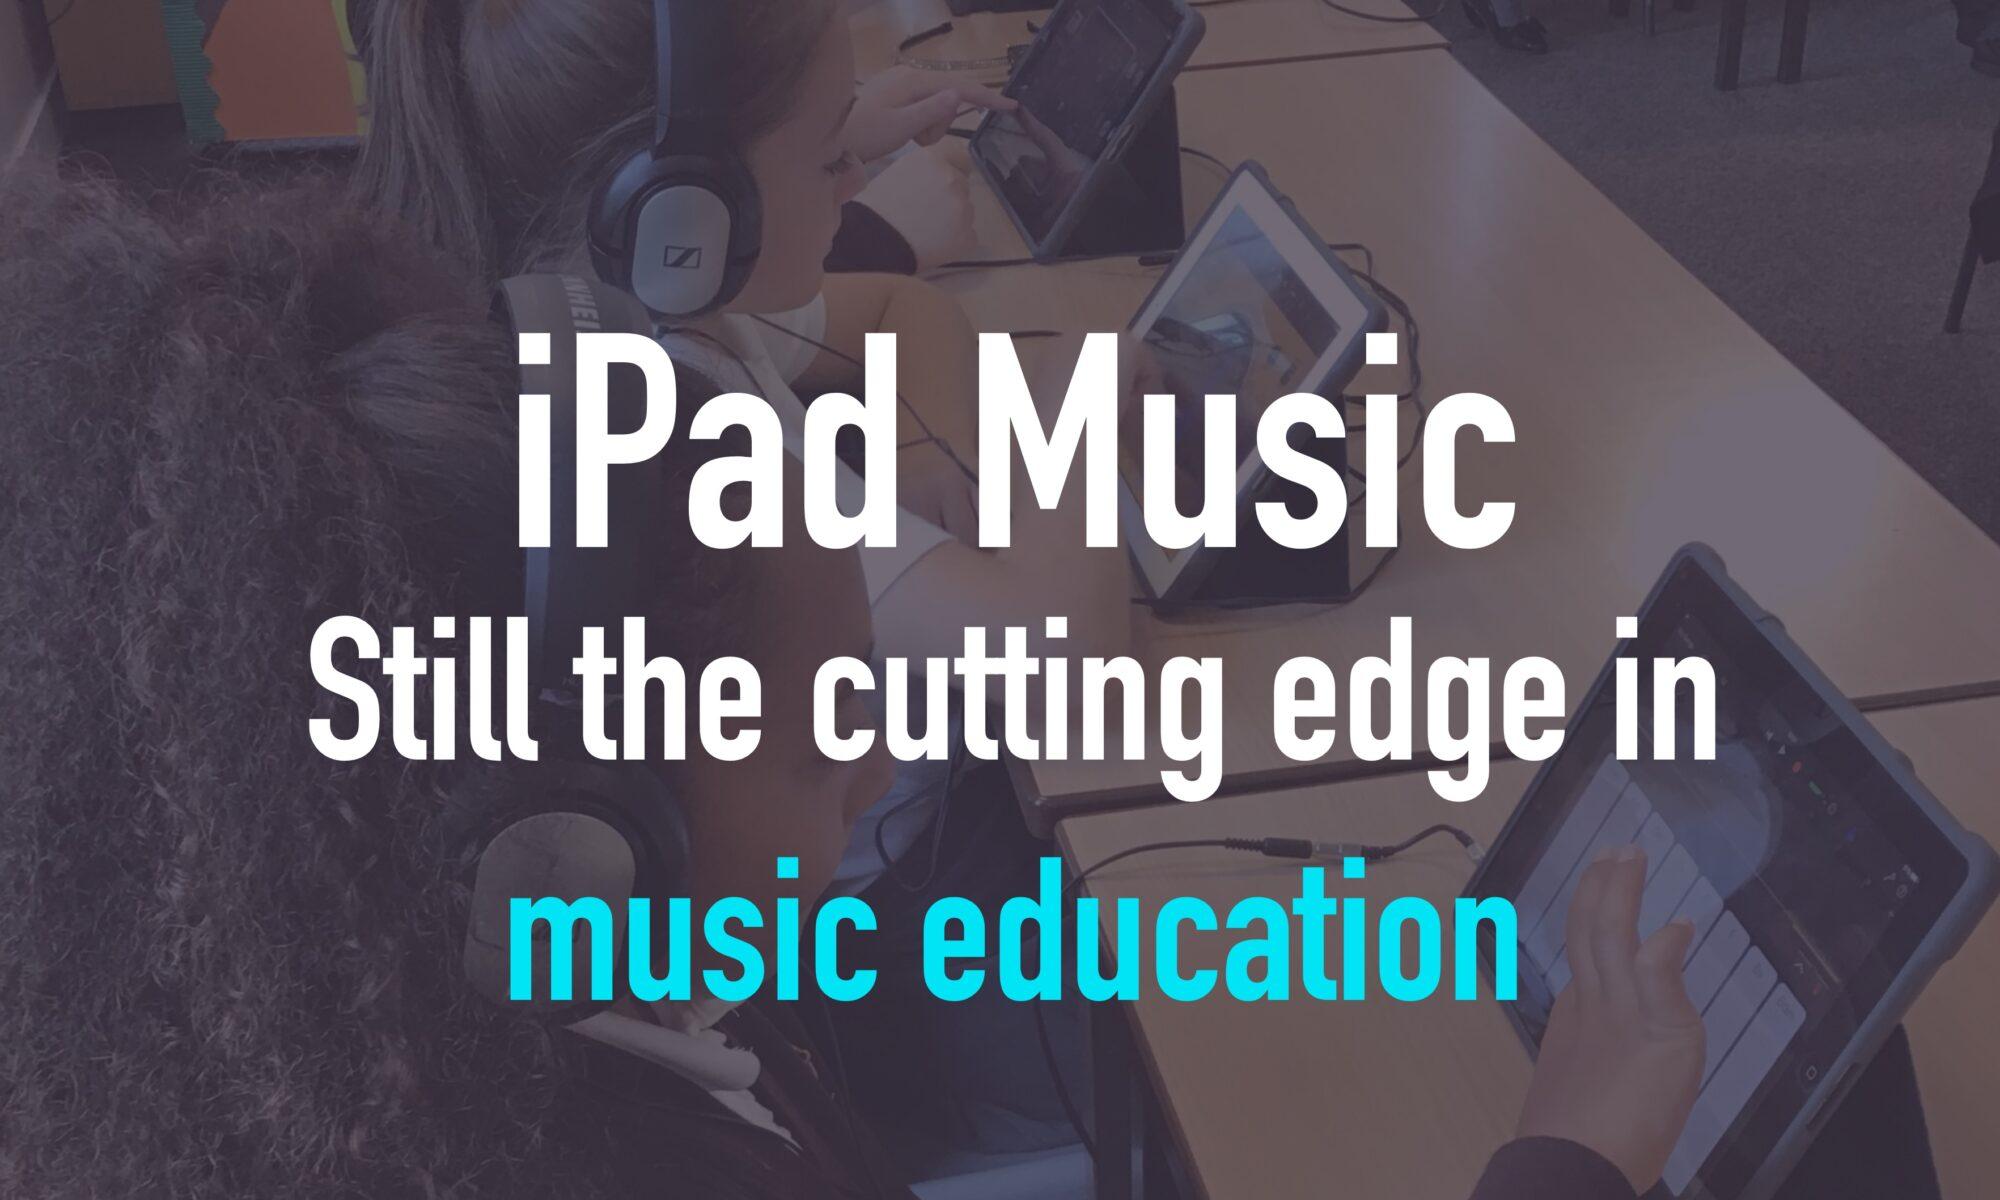 iPad music teaching